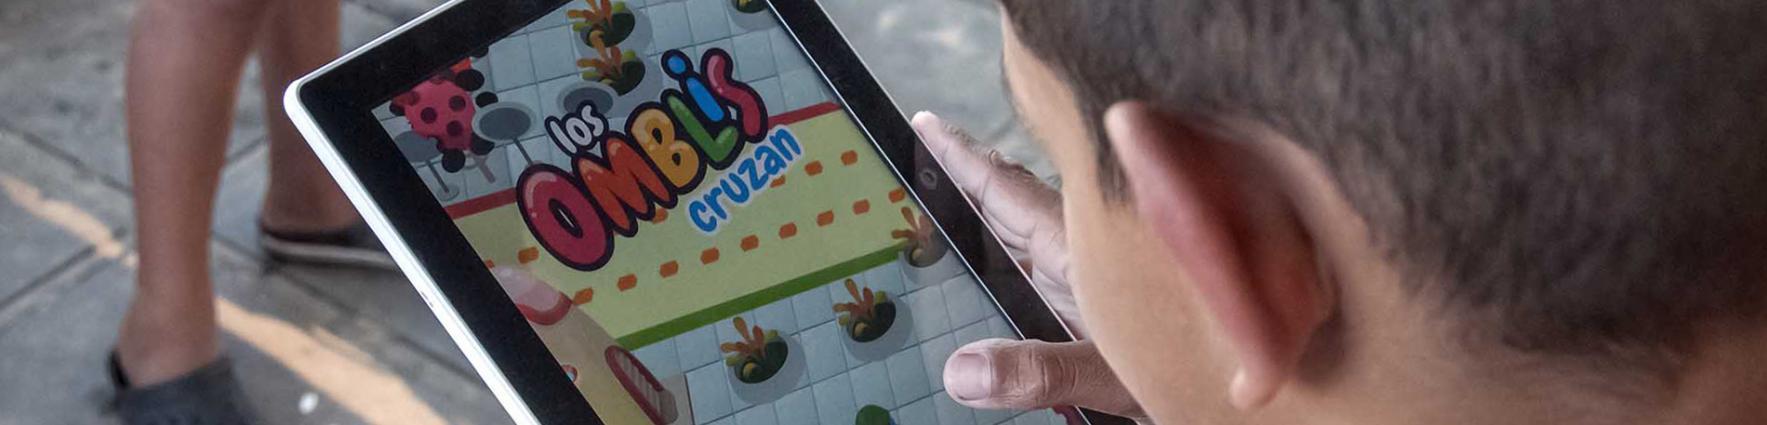 Tablet con la app omblis